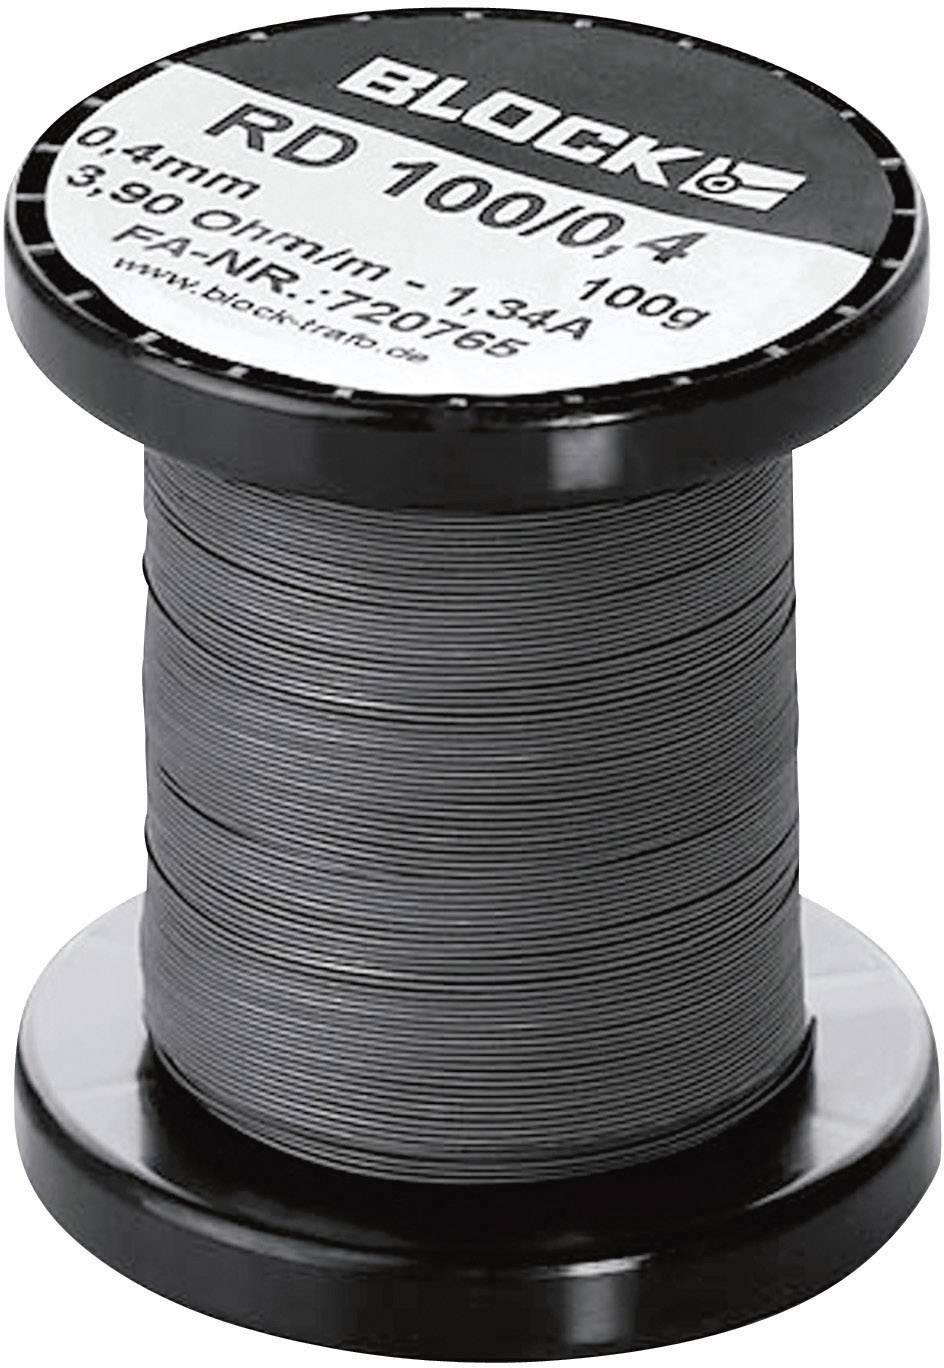 Odporový drát (konstantan) Block RD 100/2,0, 0.156 Ω/m, 3.5 m